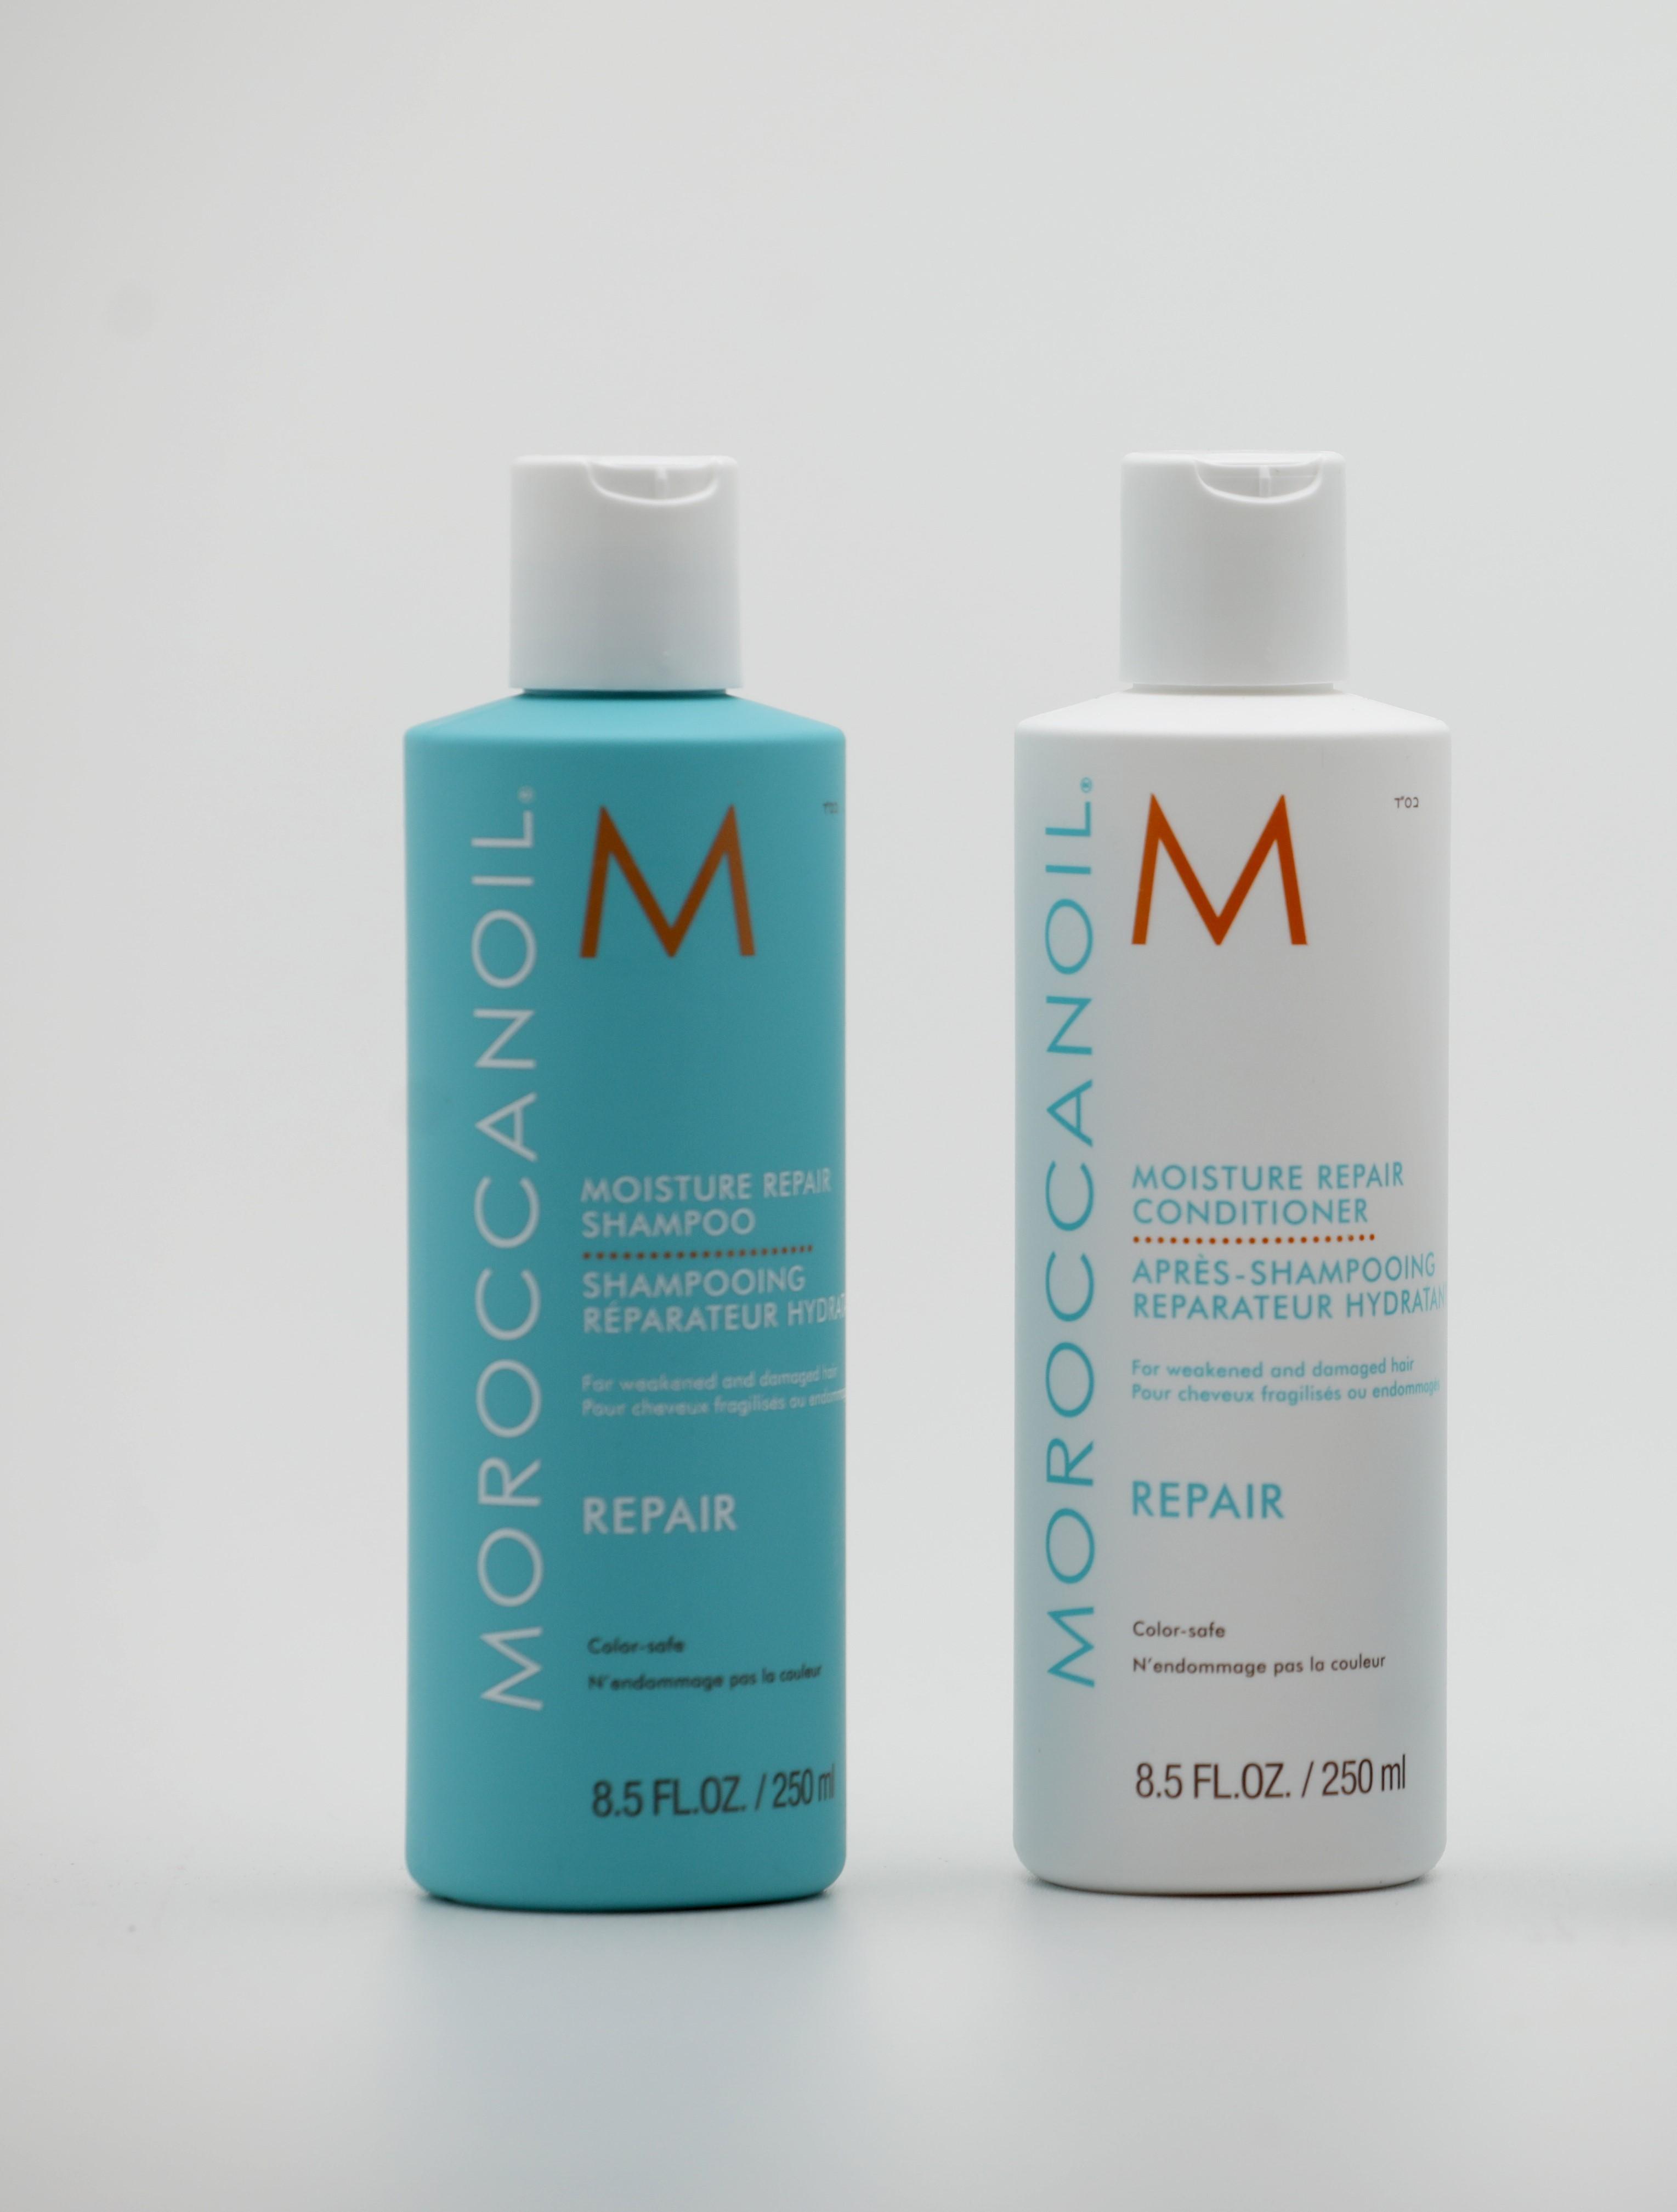 shampoing et après shampoing repair